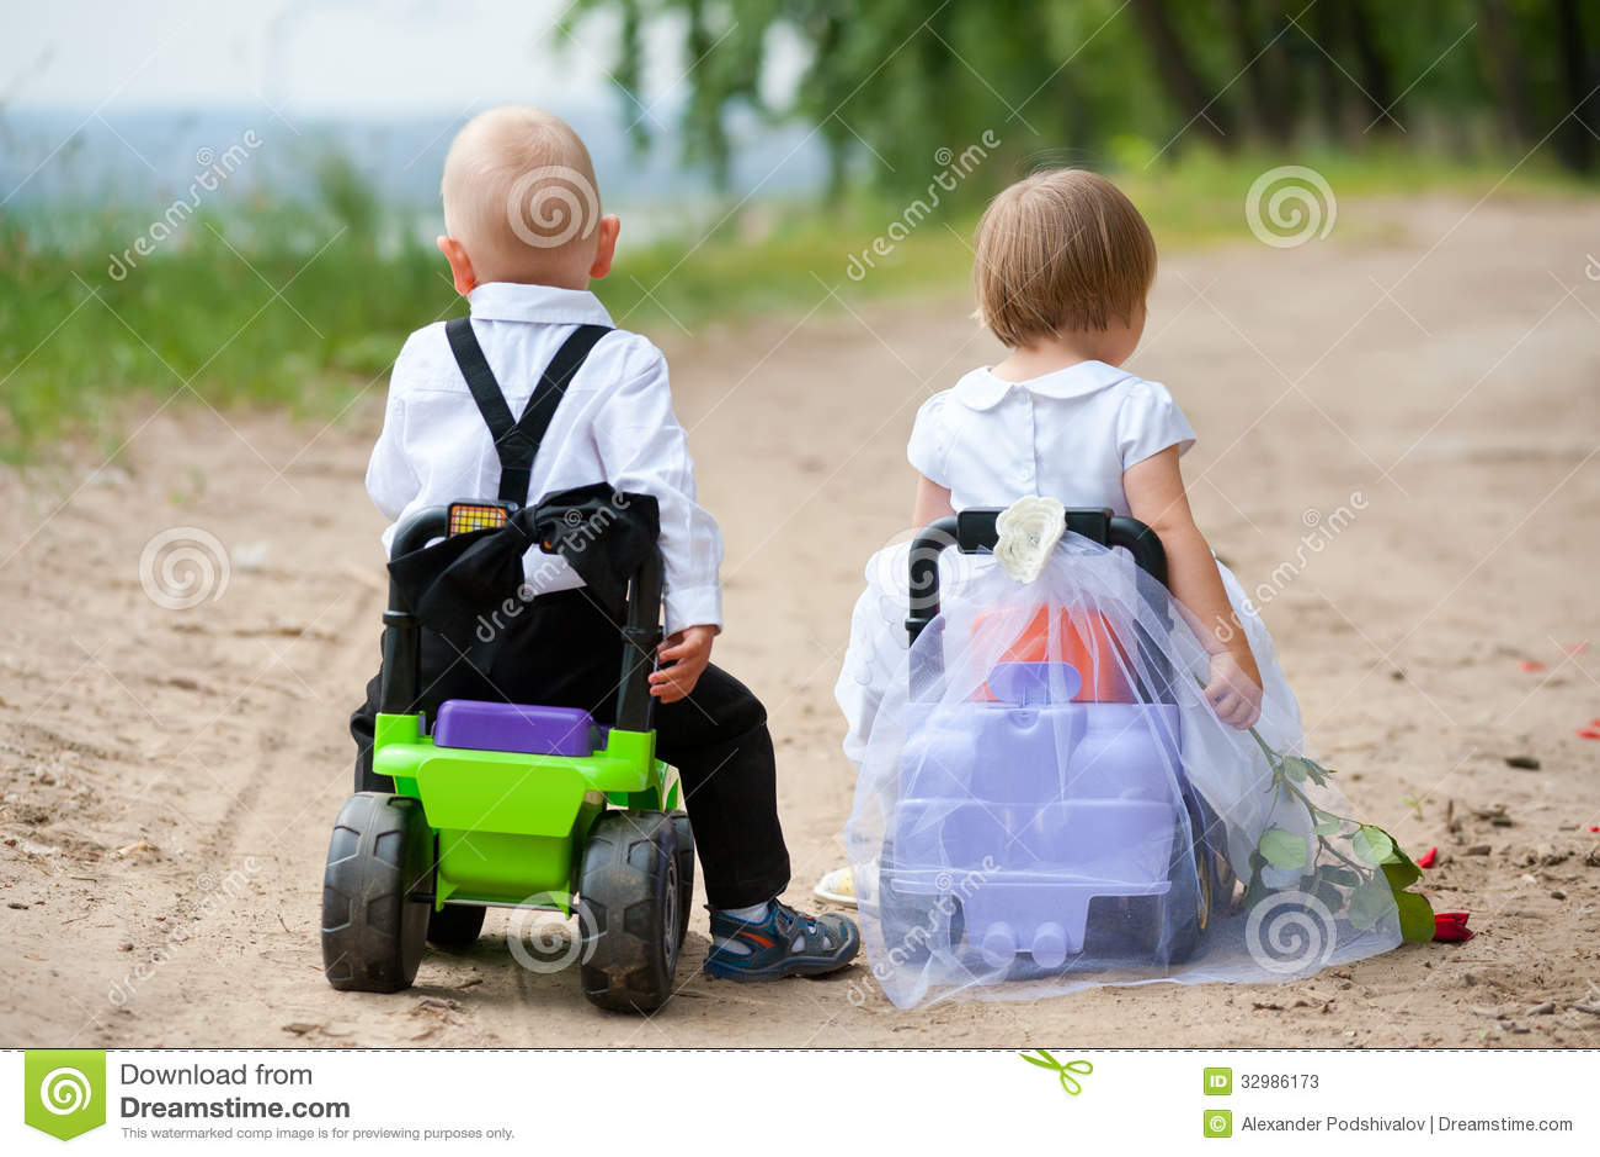 Toys For Boys Wedding : Wedding trip stock photos image